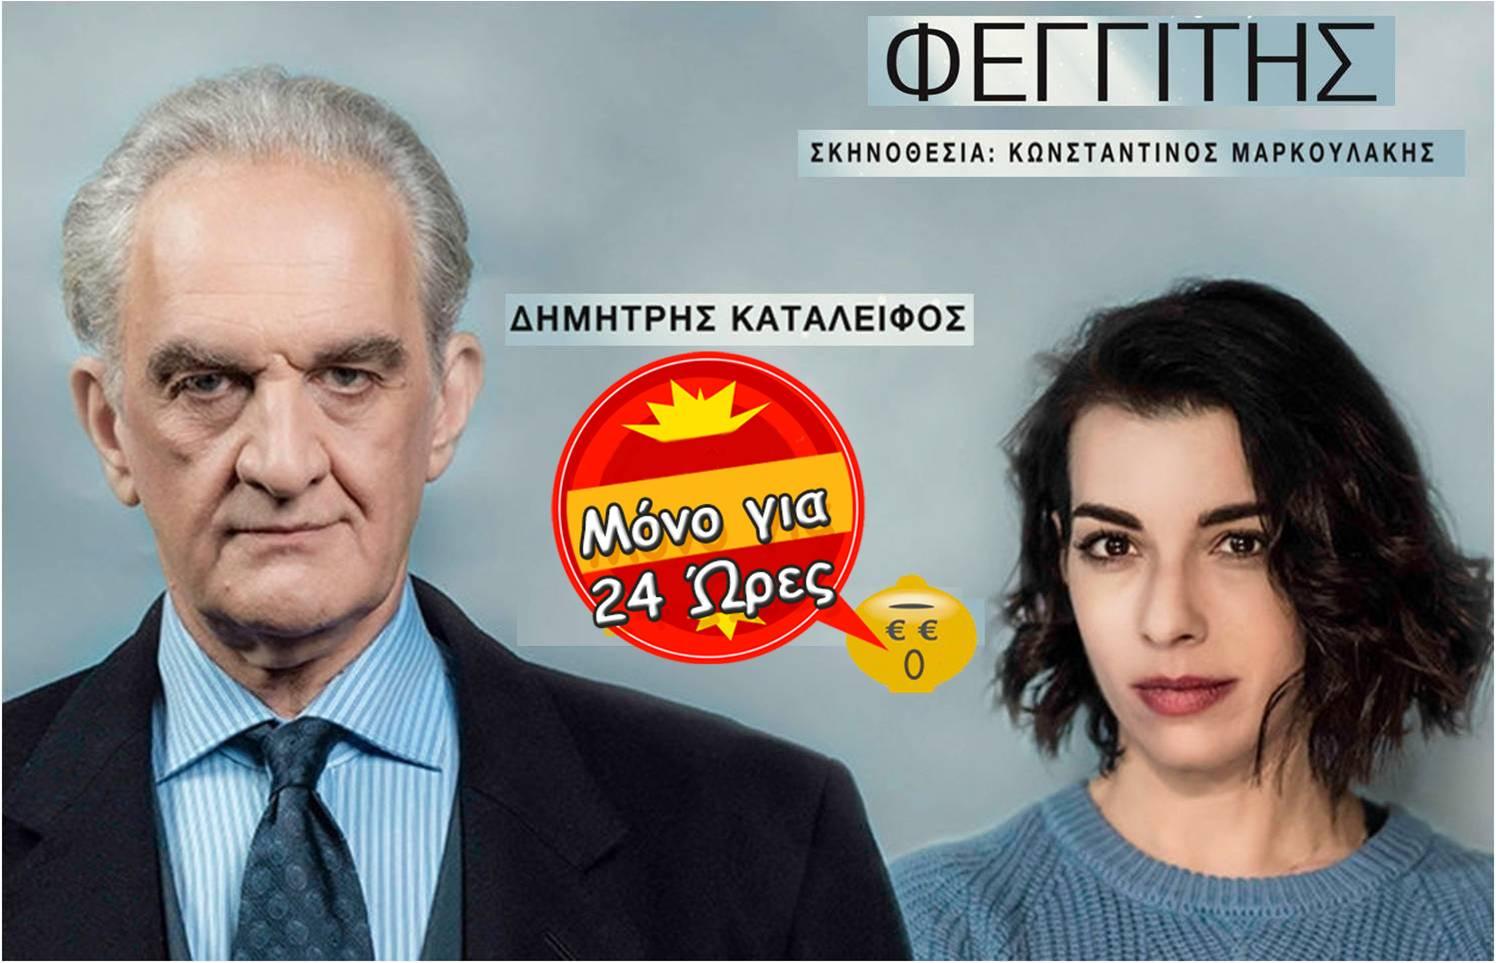 MONO ΓΙΑ 24 ΩΡΕΣ! Από 12€ για είσοδο στο πολυβραβευμένο έργο ''Φεγγίτης